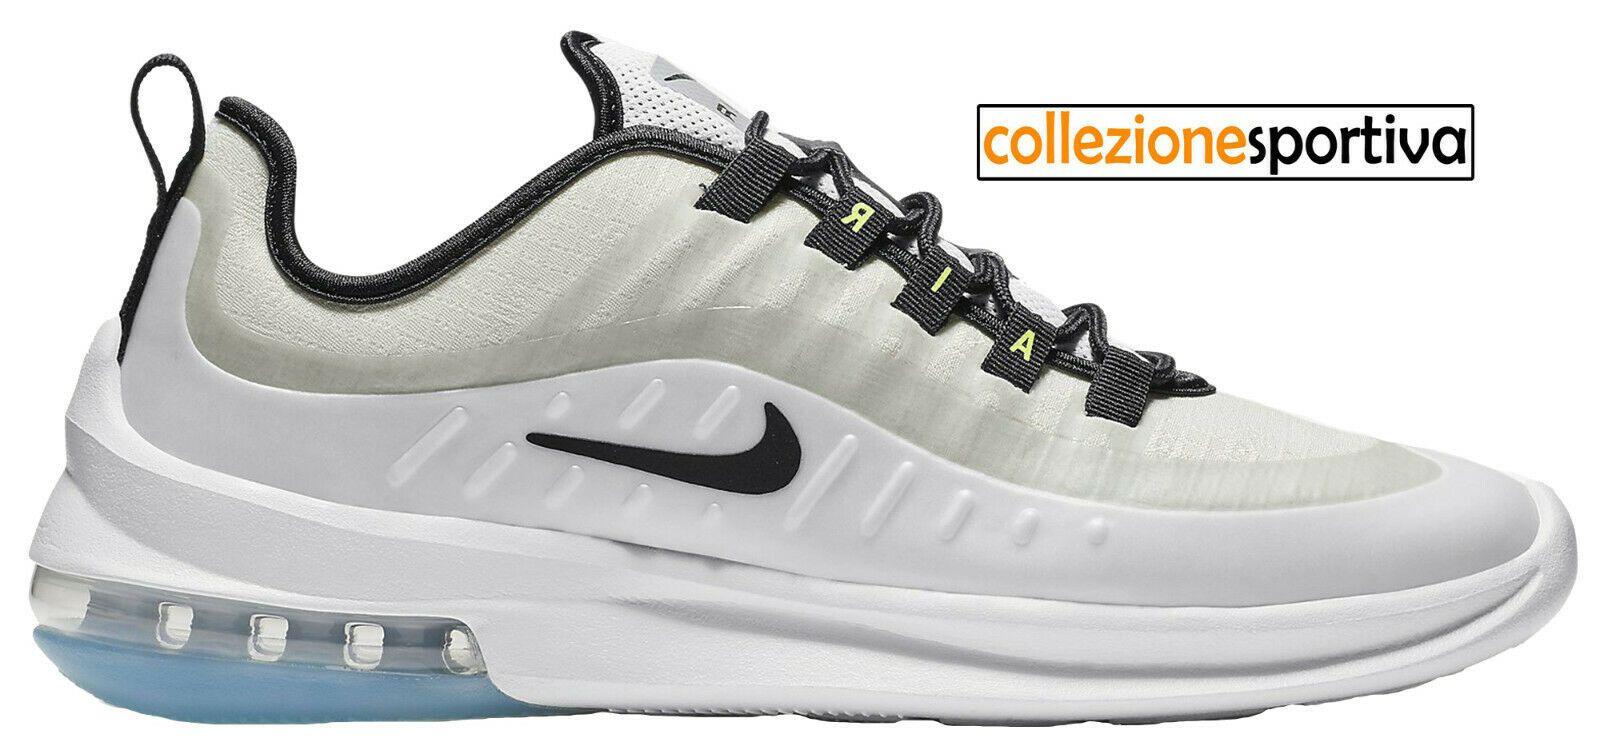 Nike Air Max Axis,MICHAEL KORS,Oakley,